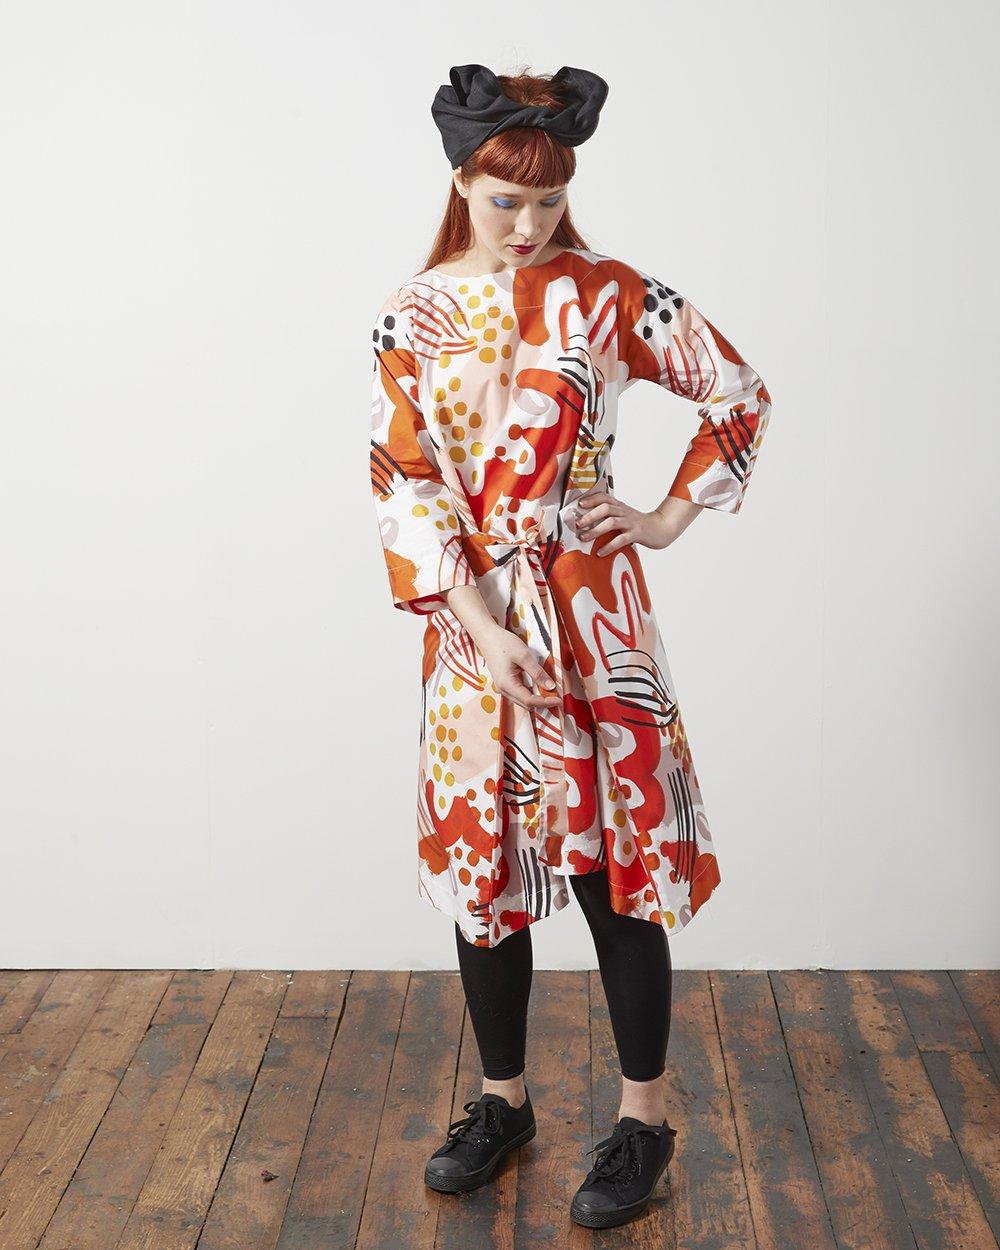 Woman wearing colourful patterned dress by Georgia Boniface